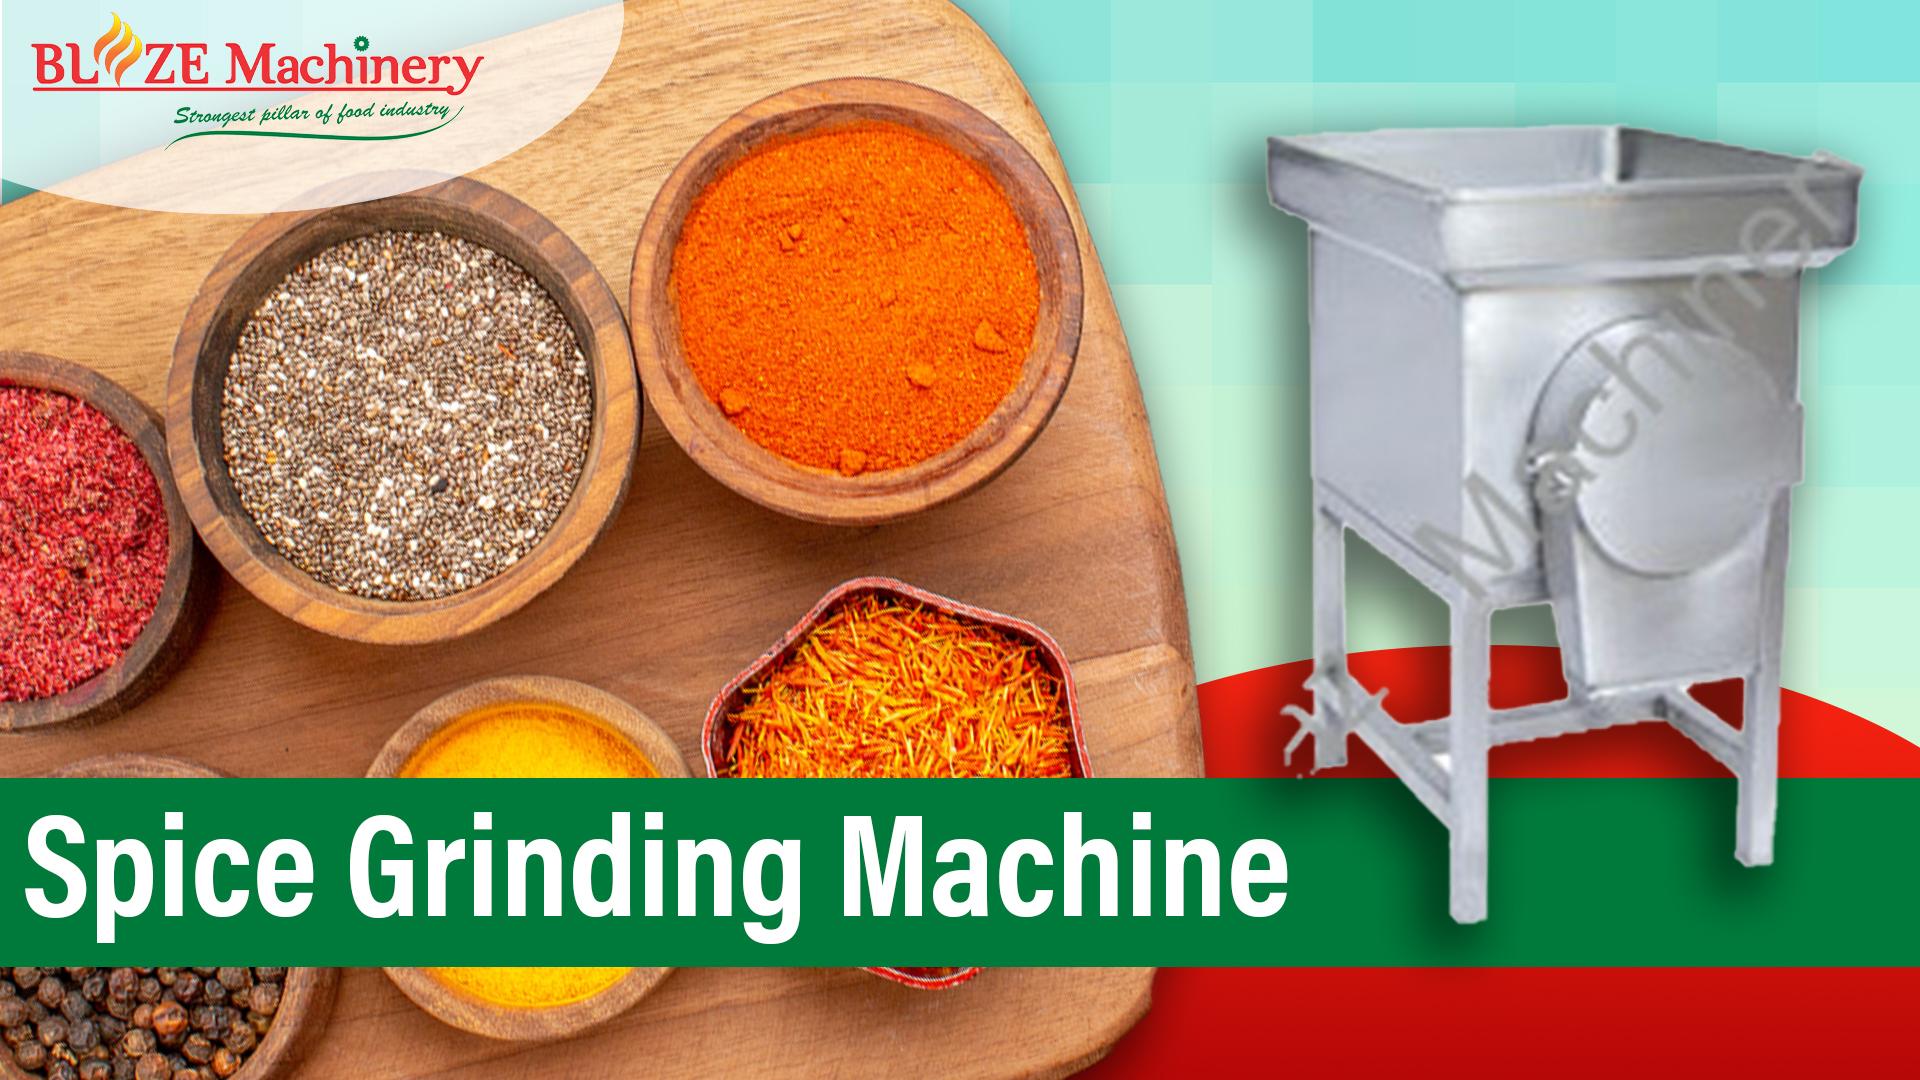 Spice Grinding Machine